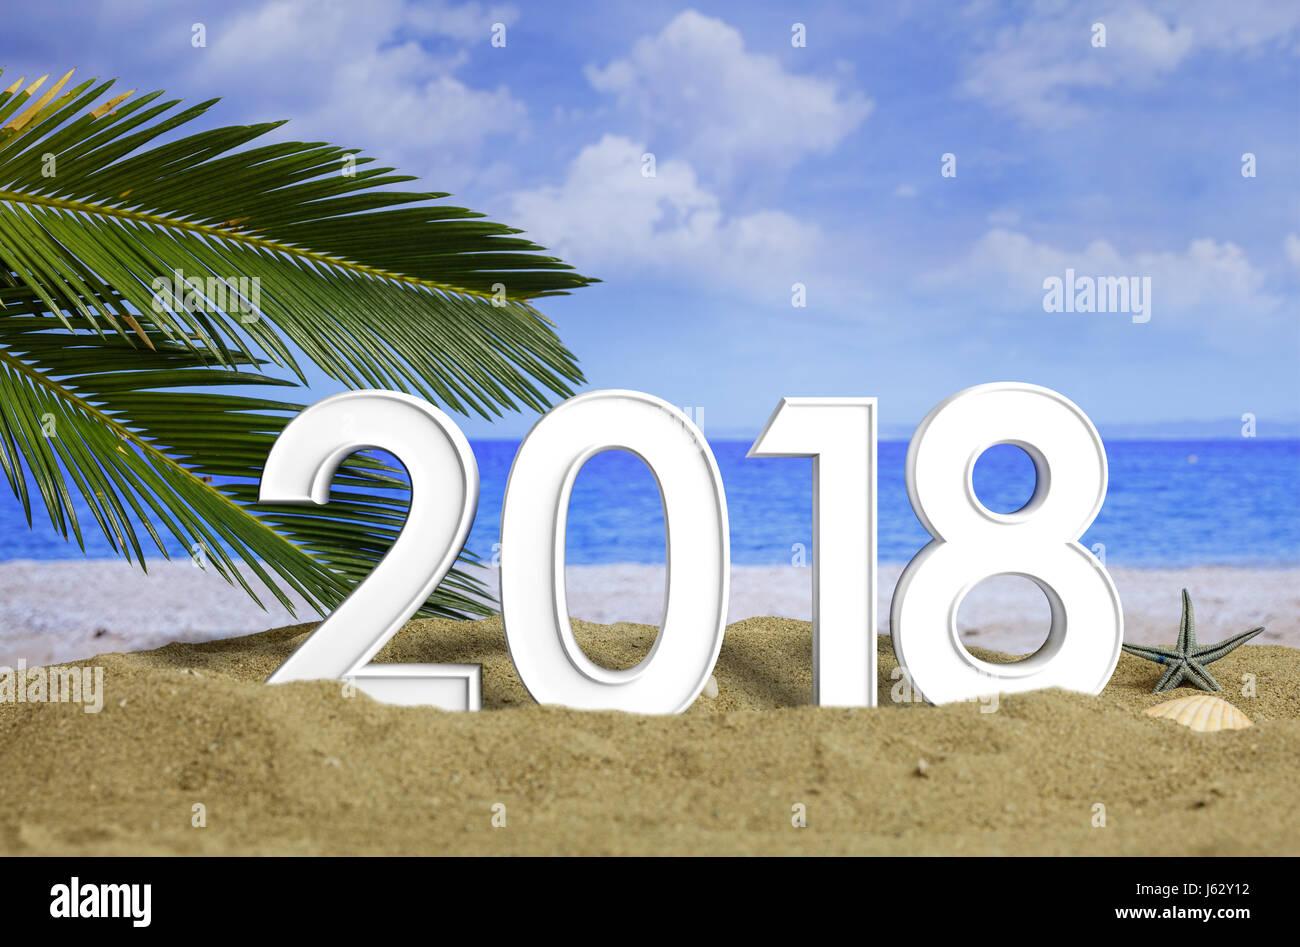 New Year 2018 On A Sandy Beach. New Year Beach Vacation